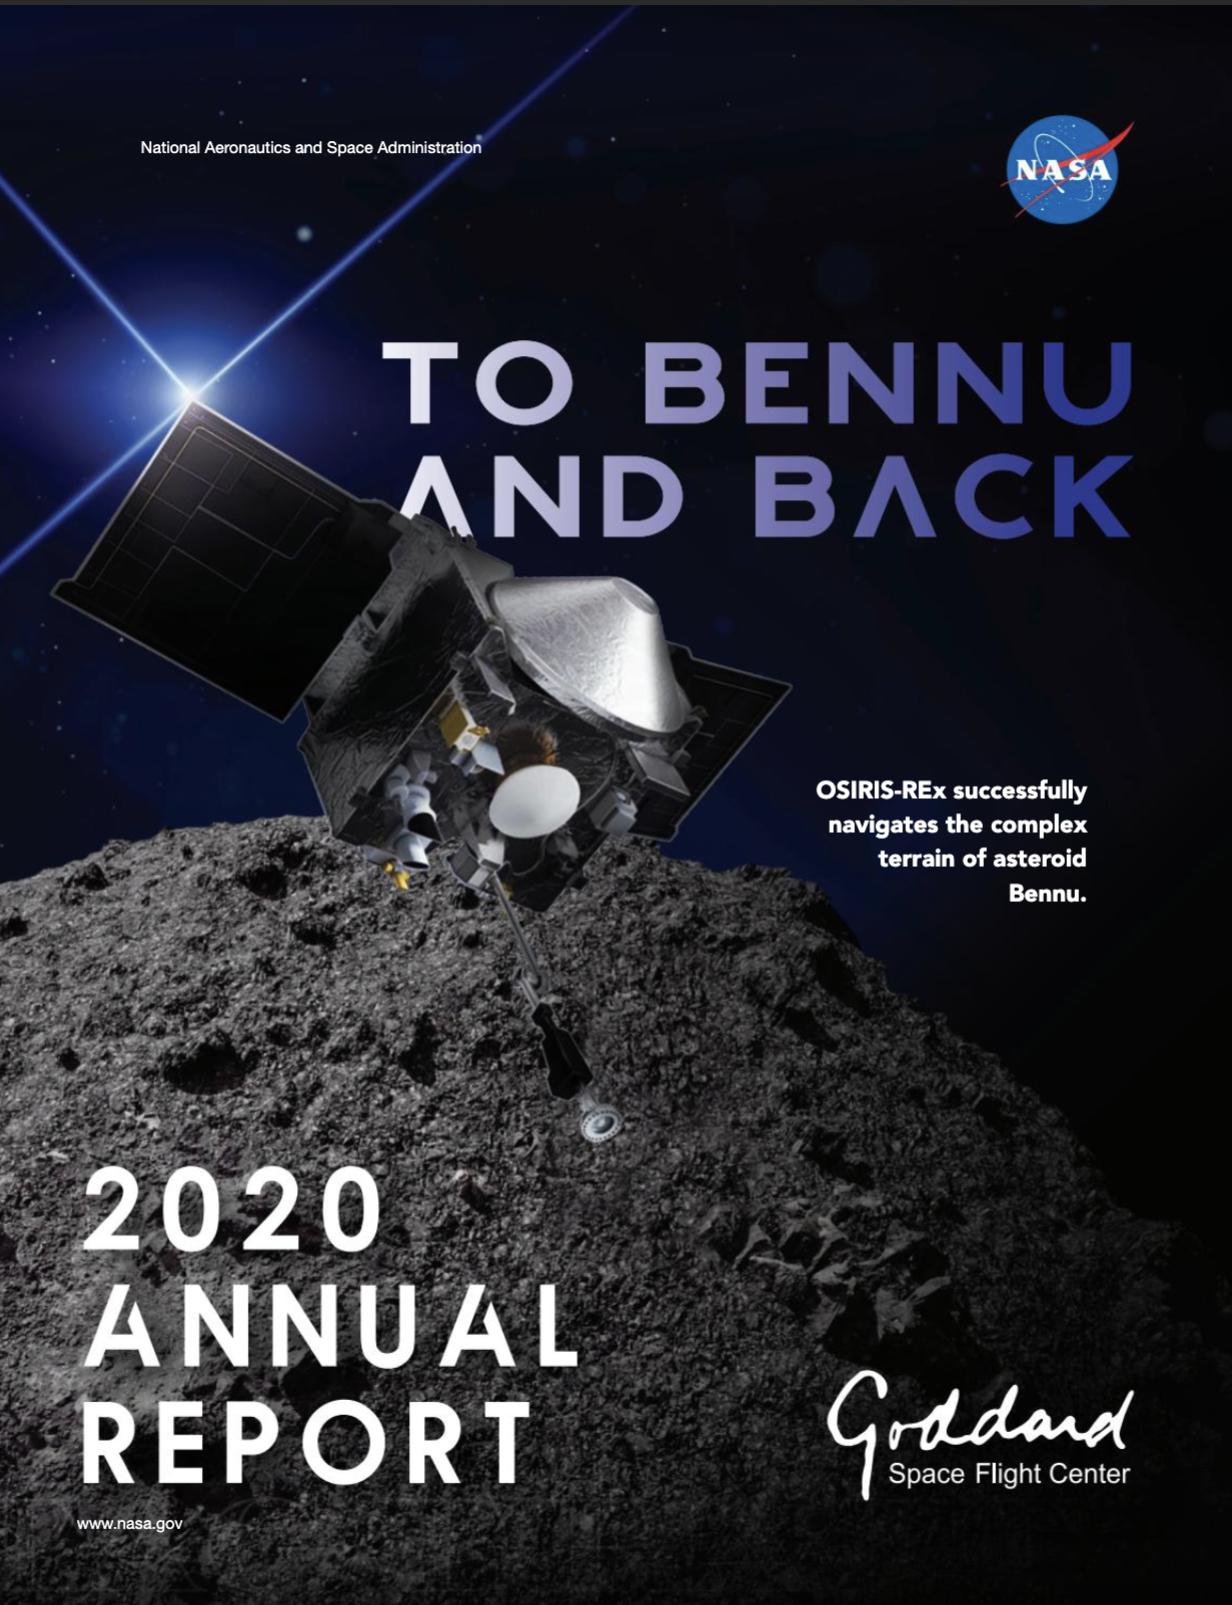 Goddard Space Flight Center Annual Report 2020